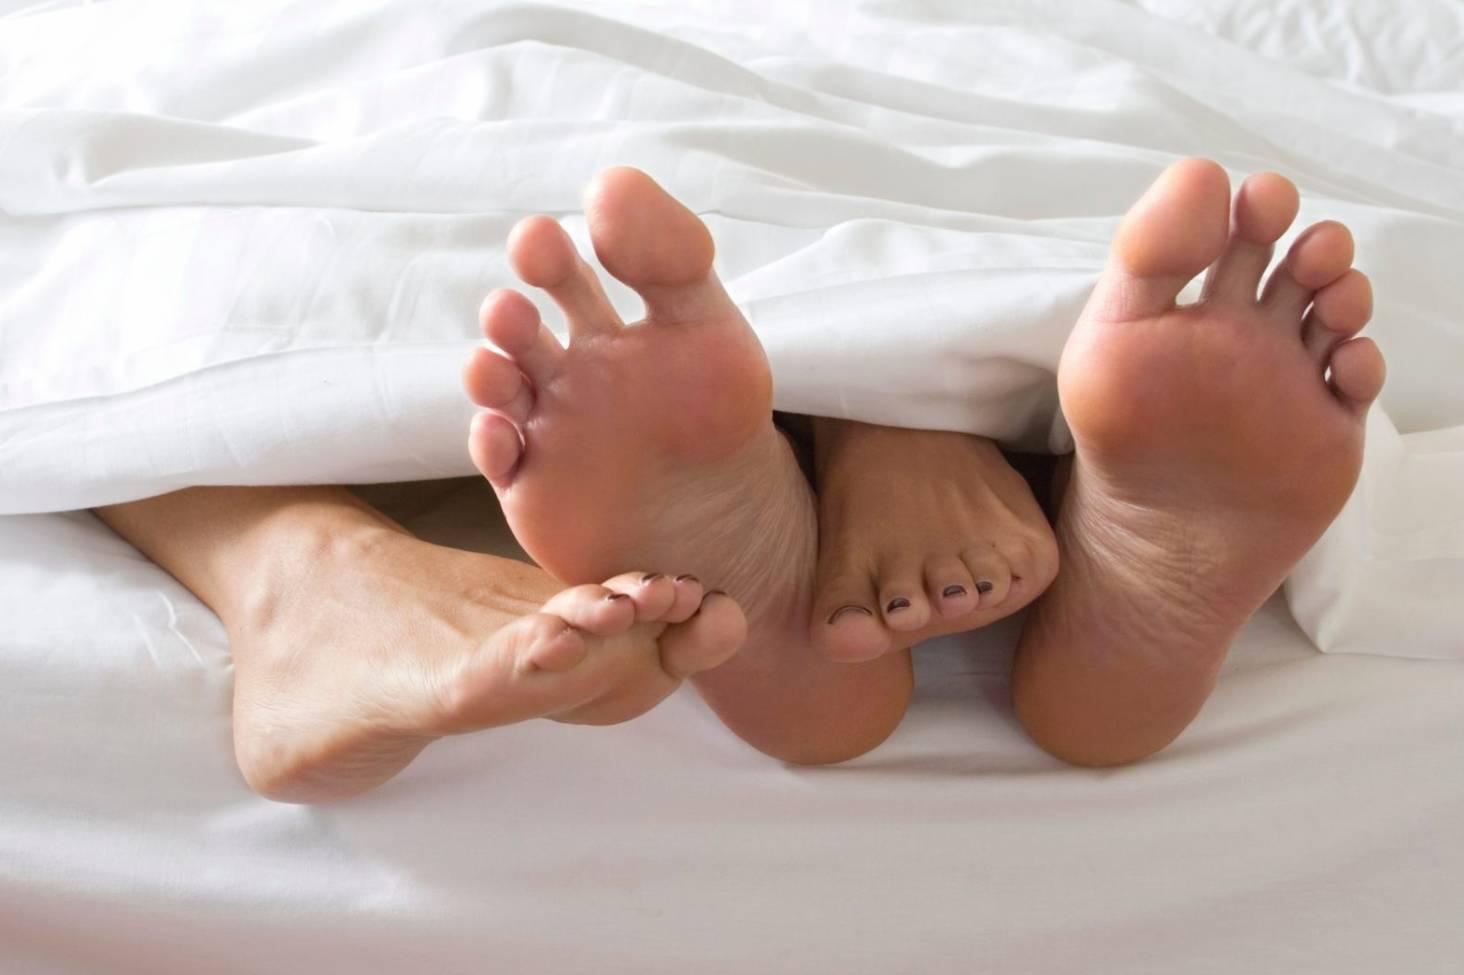 Women having sex during their period